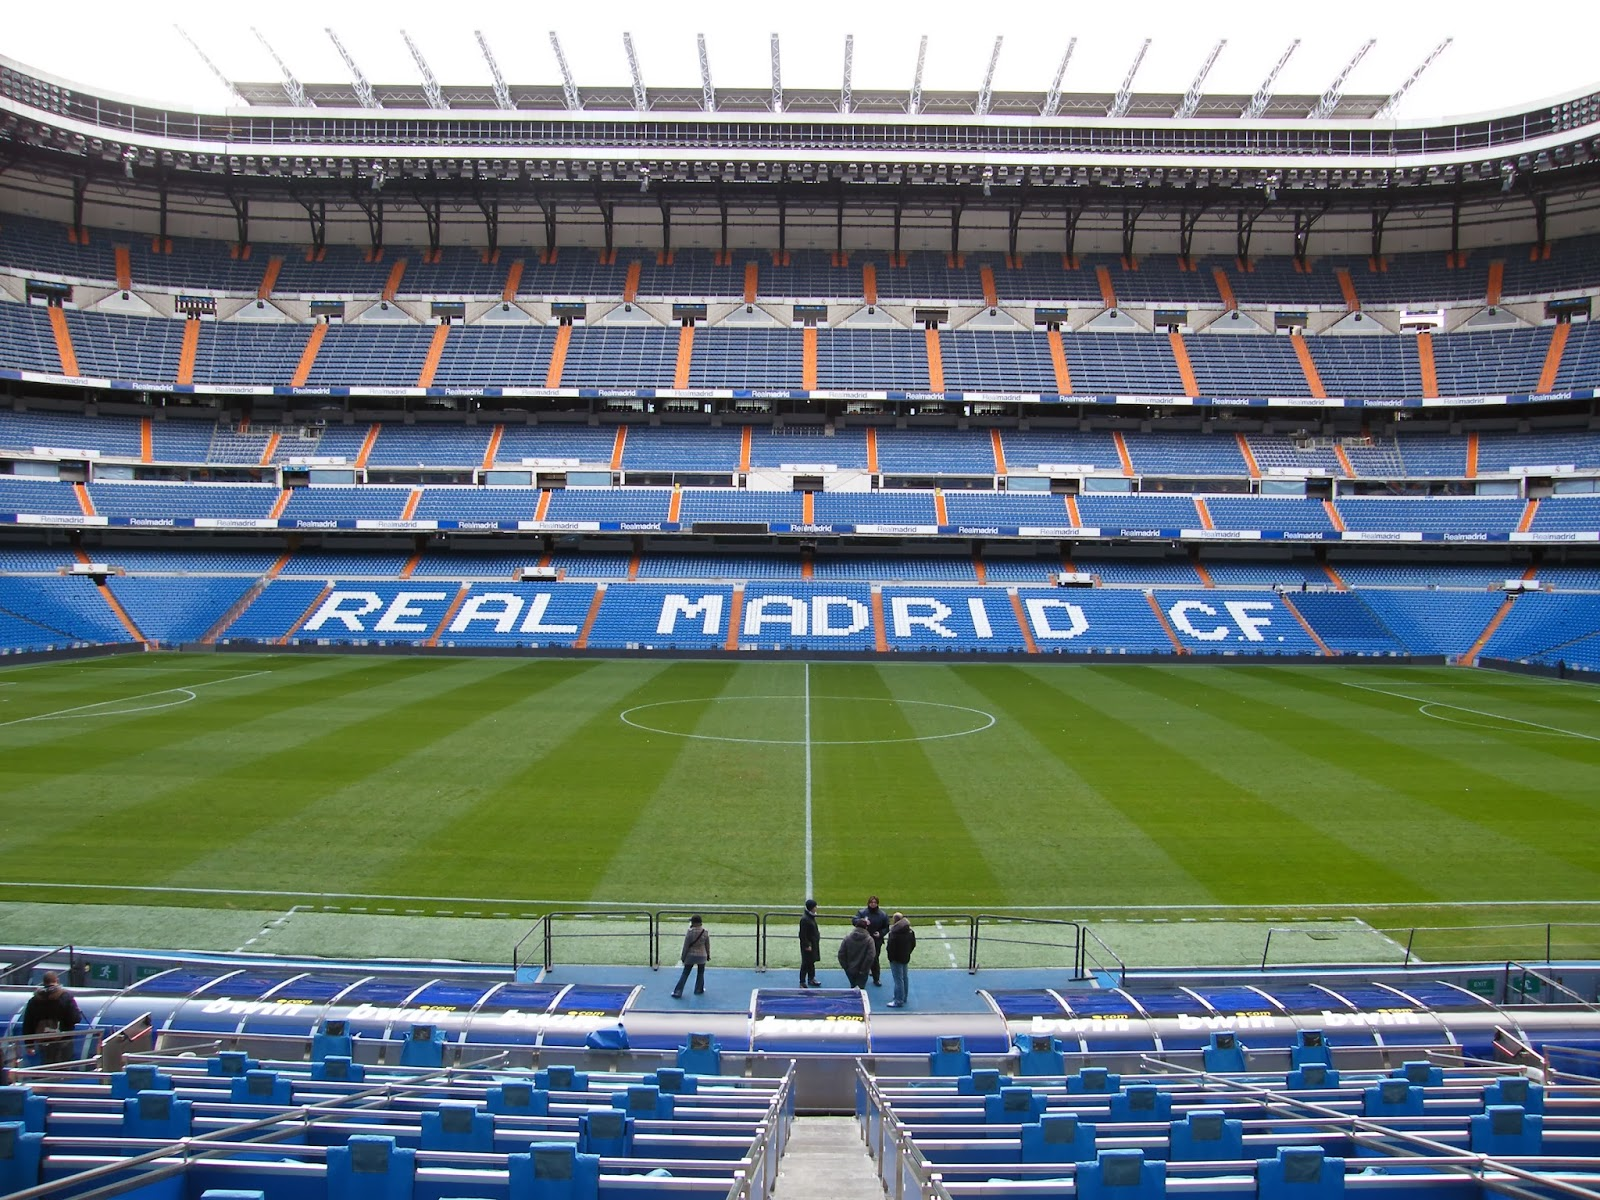 Estádio-Santiago-Bernabéu-Real-Madrid-Espanha